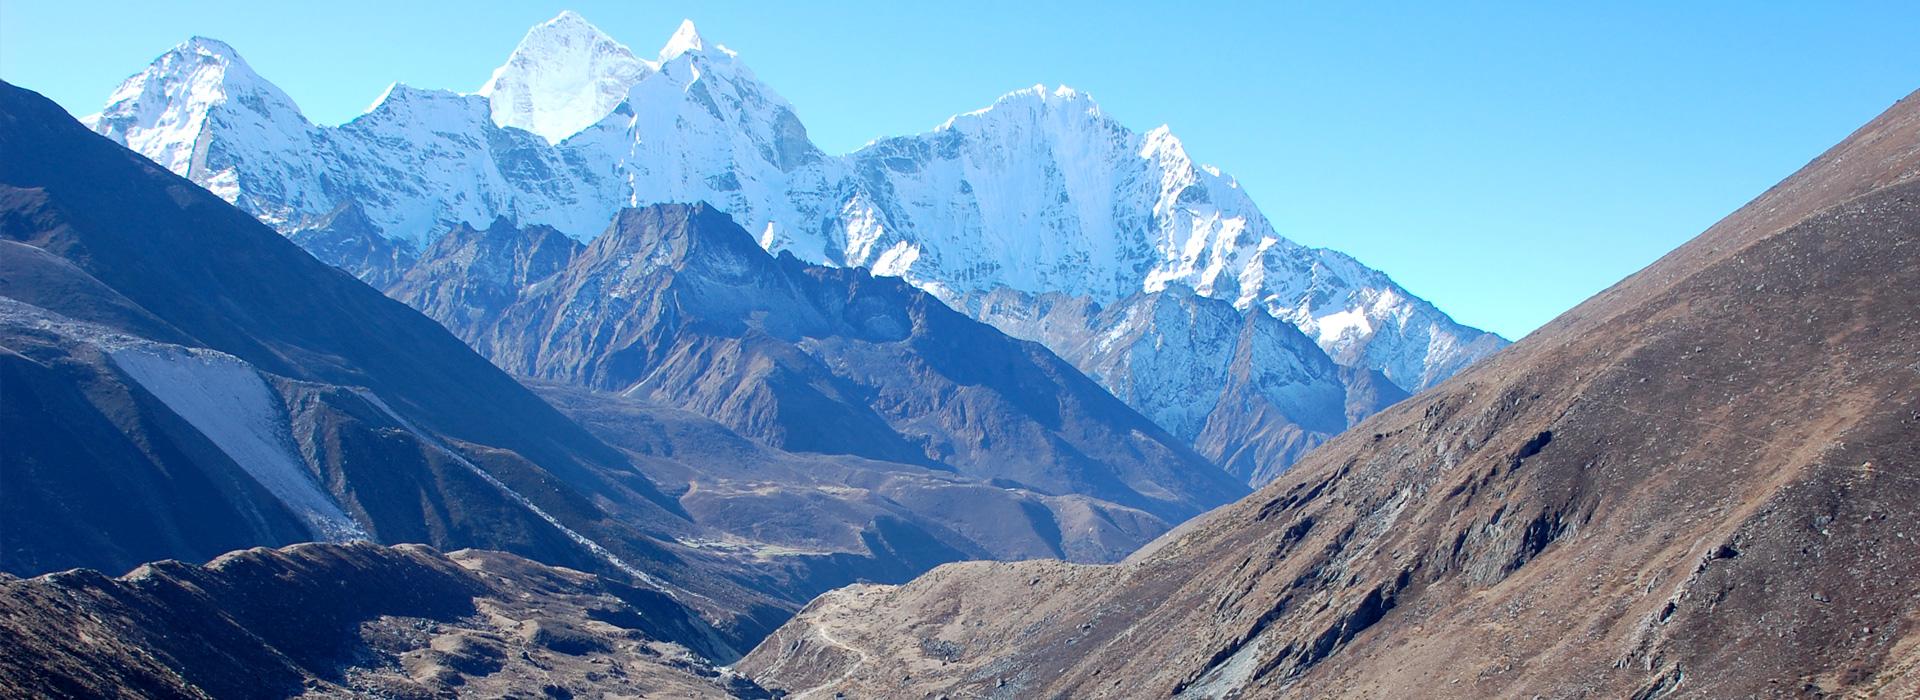 Everest27